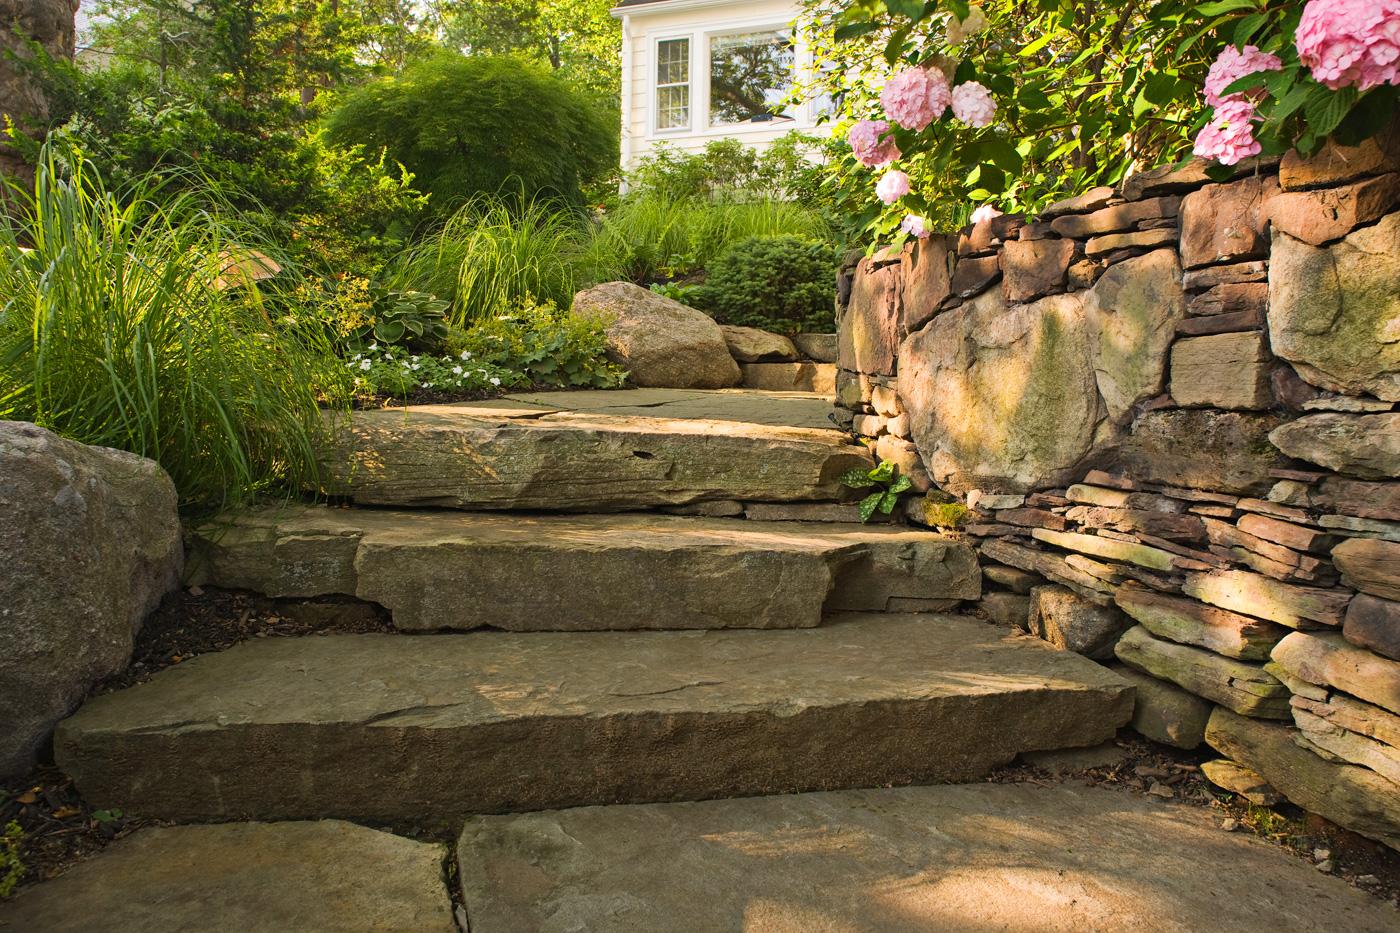 Landscaping Natural Stone : Natural stone steps by cording landscape design